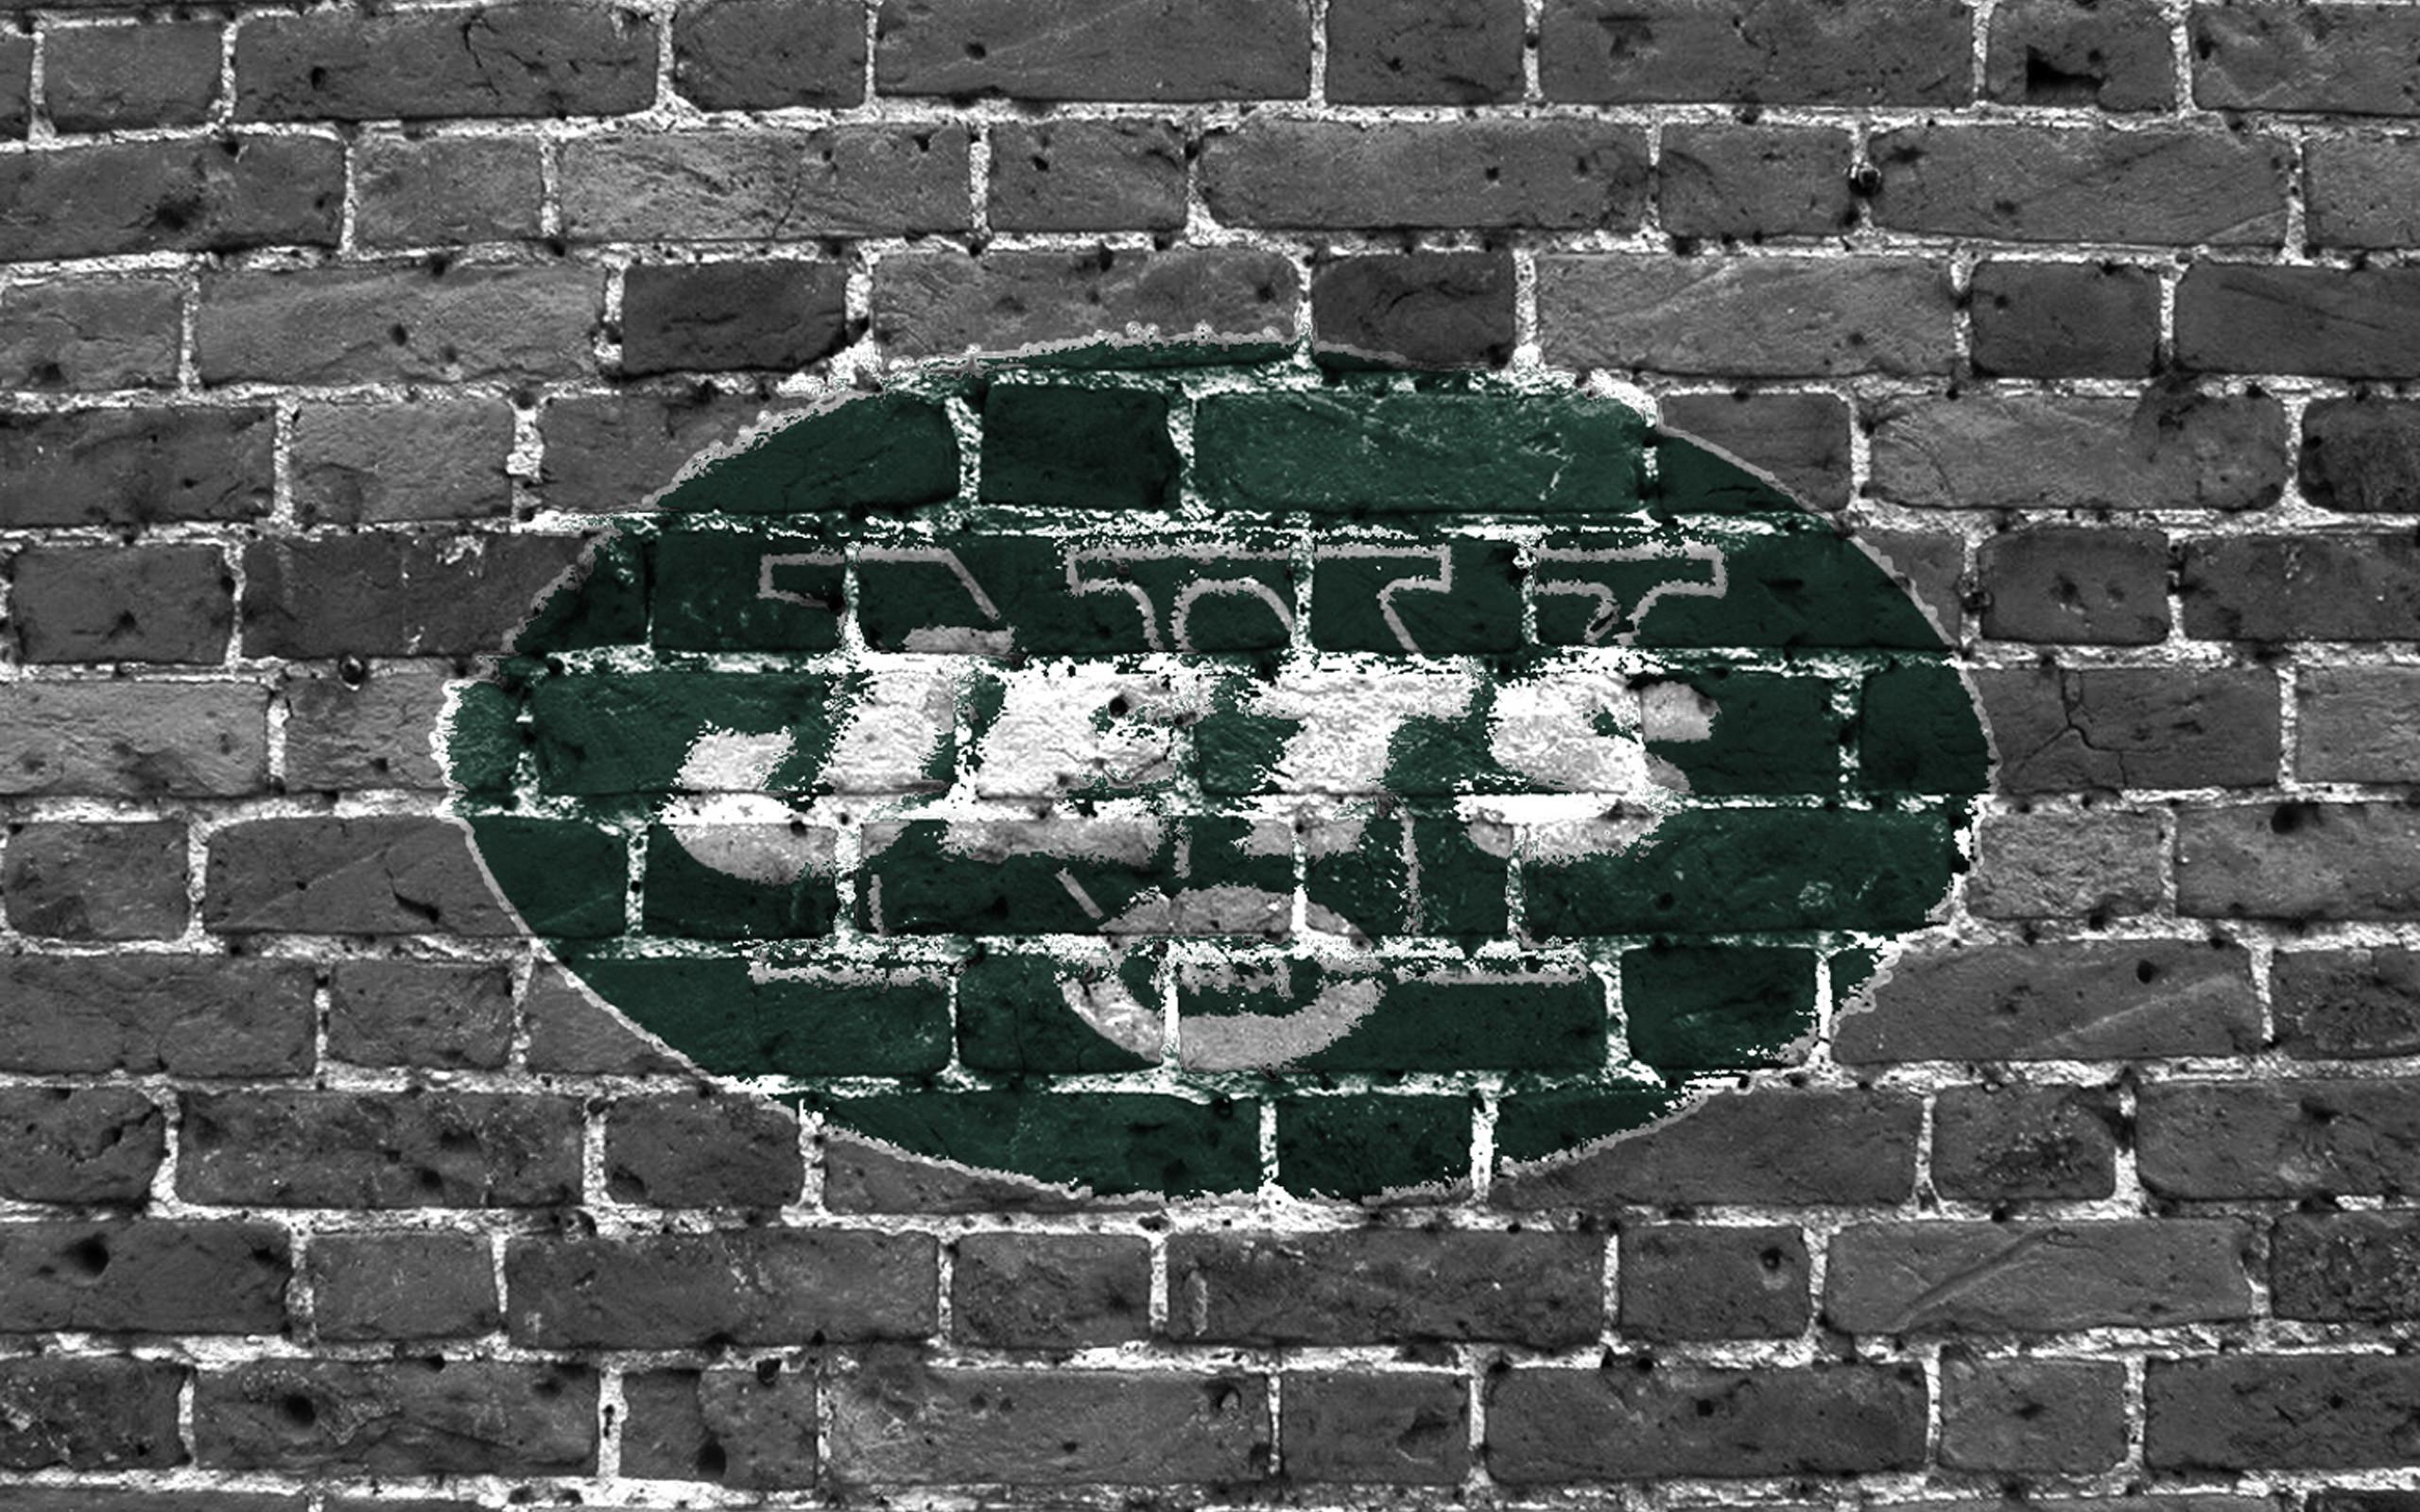 New York Jets wallpaper wallpaper ever??   New York Jets wallpapers .